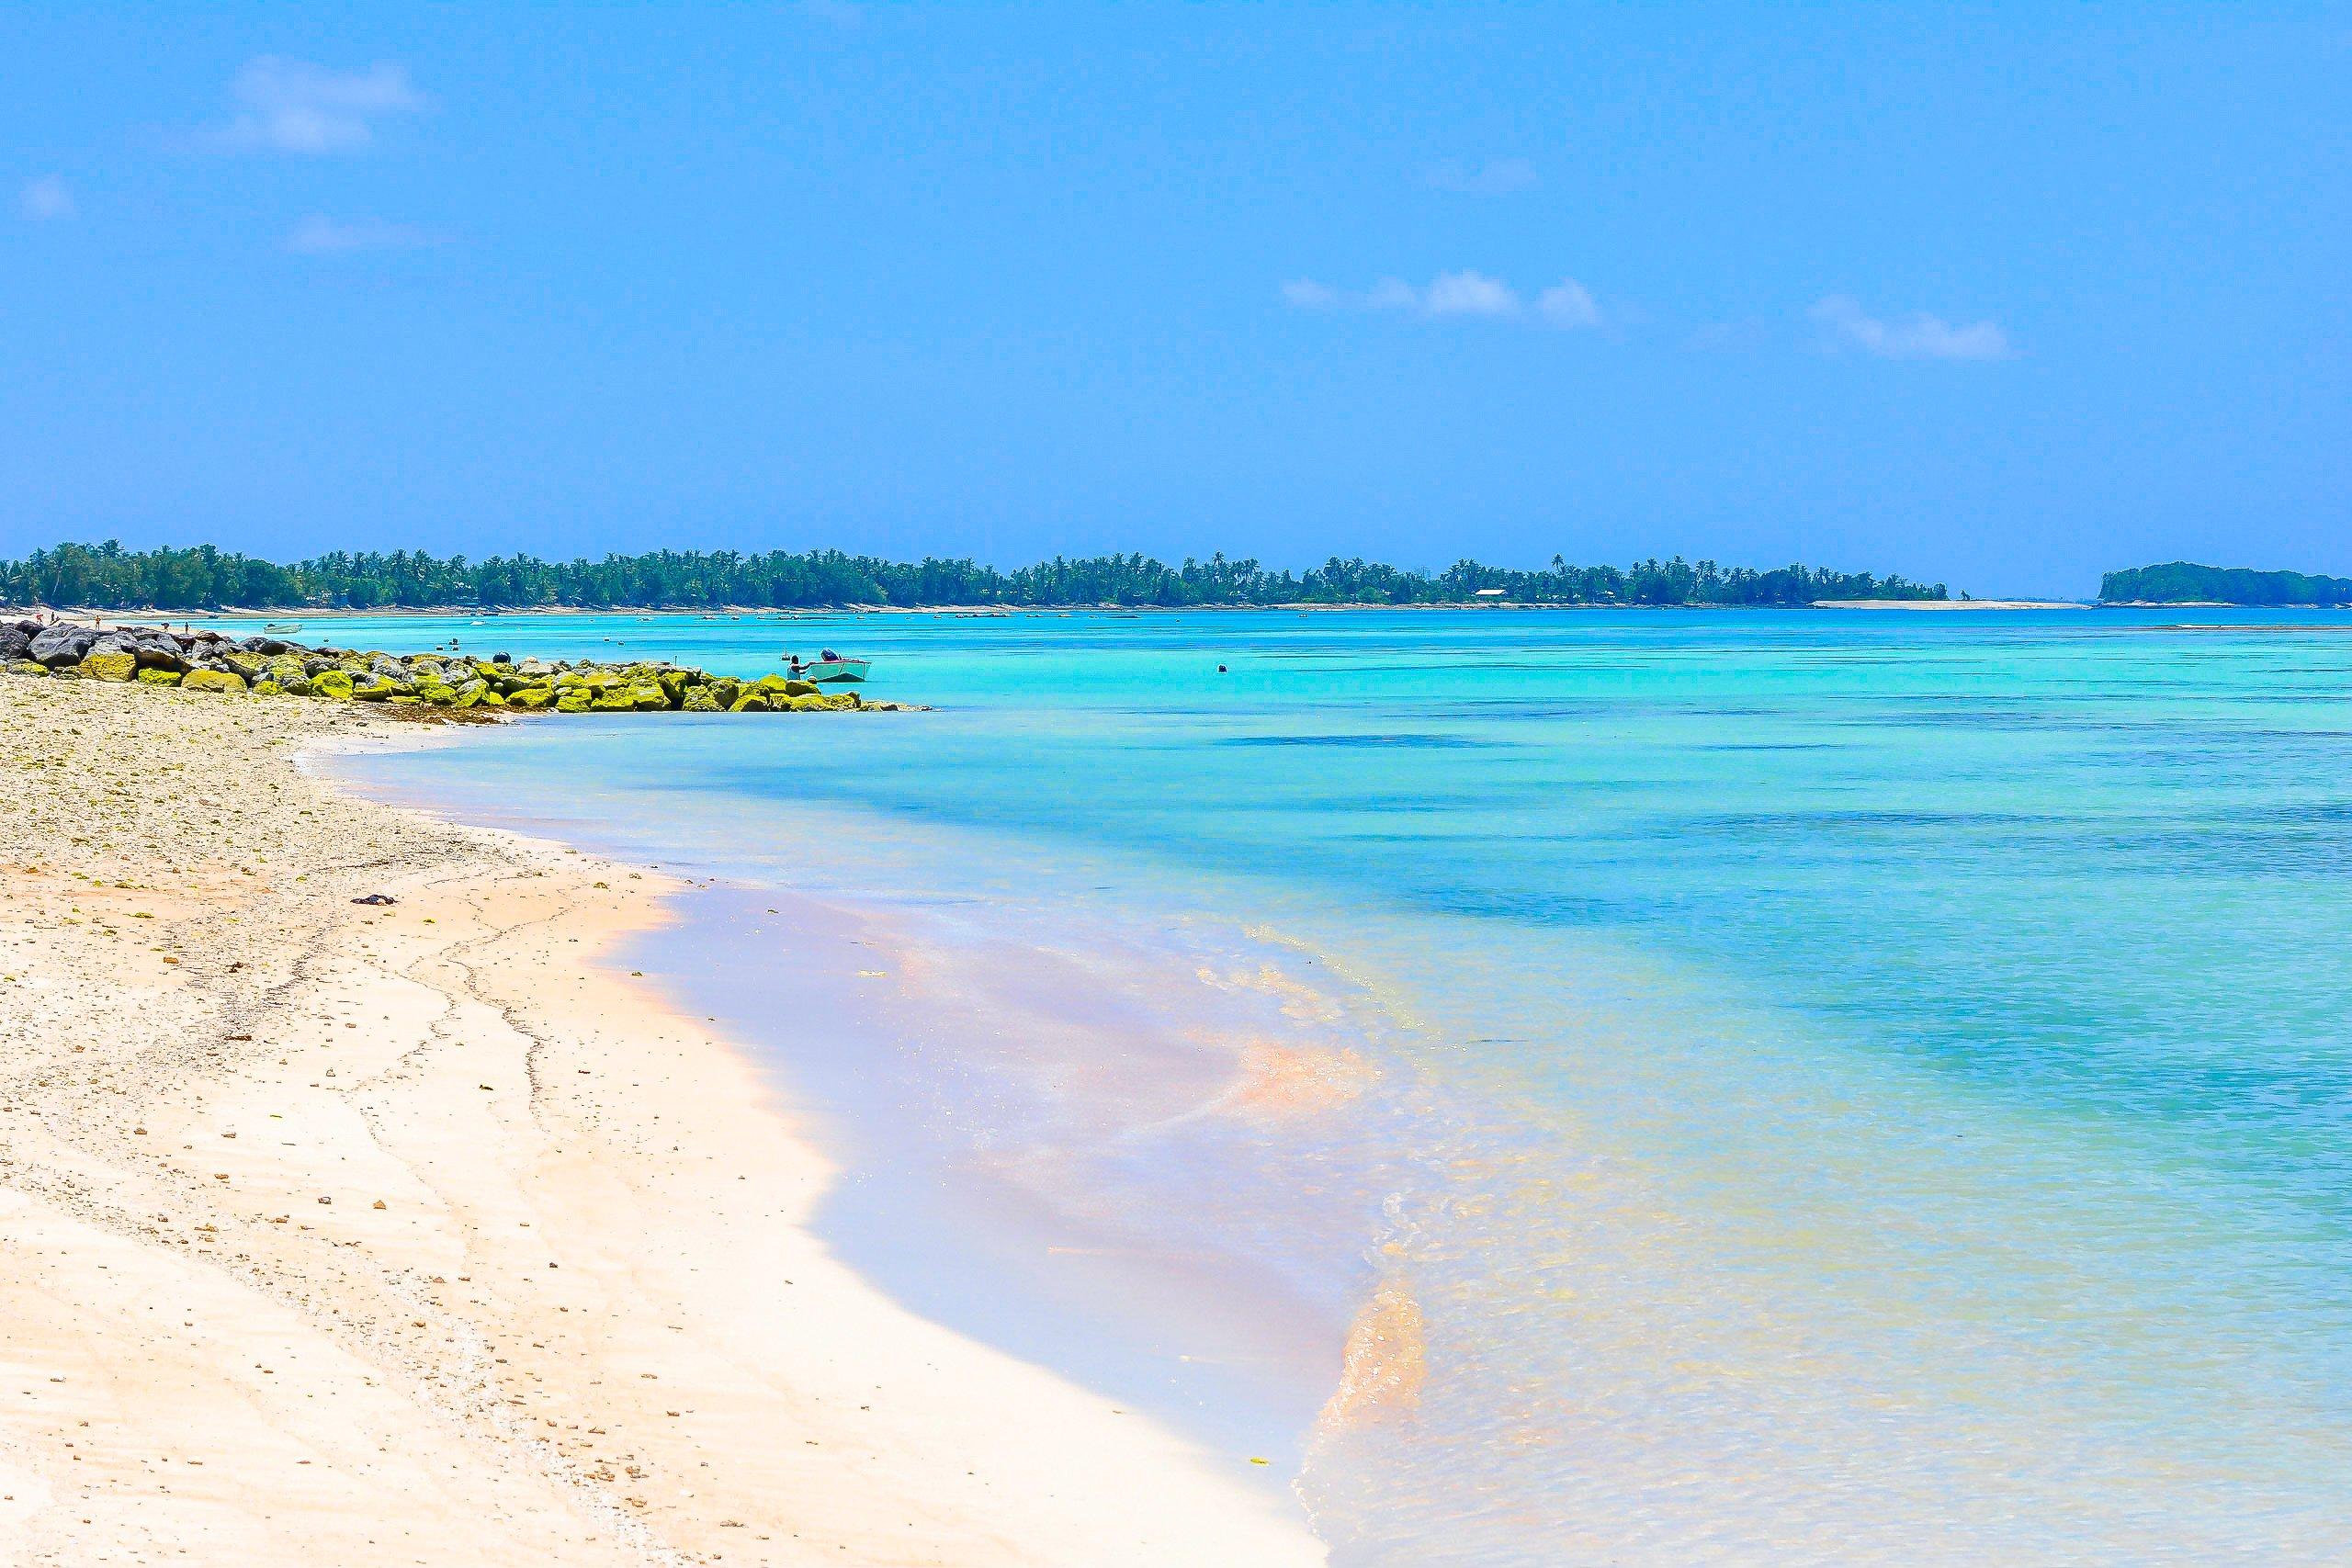 Tuvalu Islands